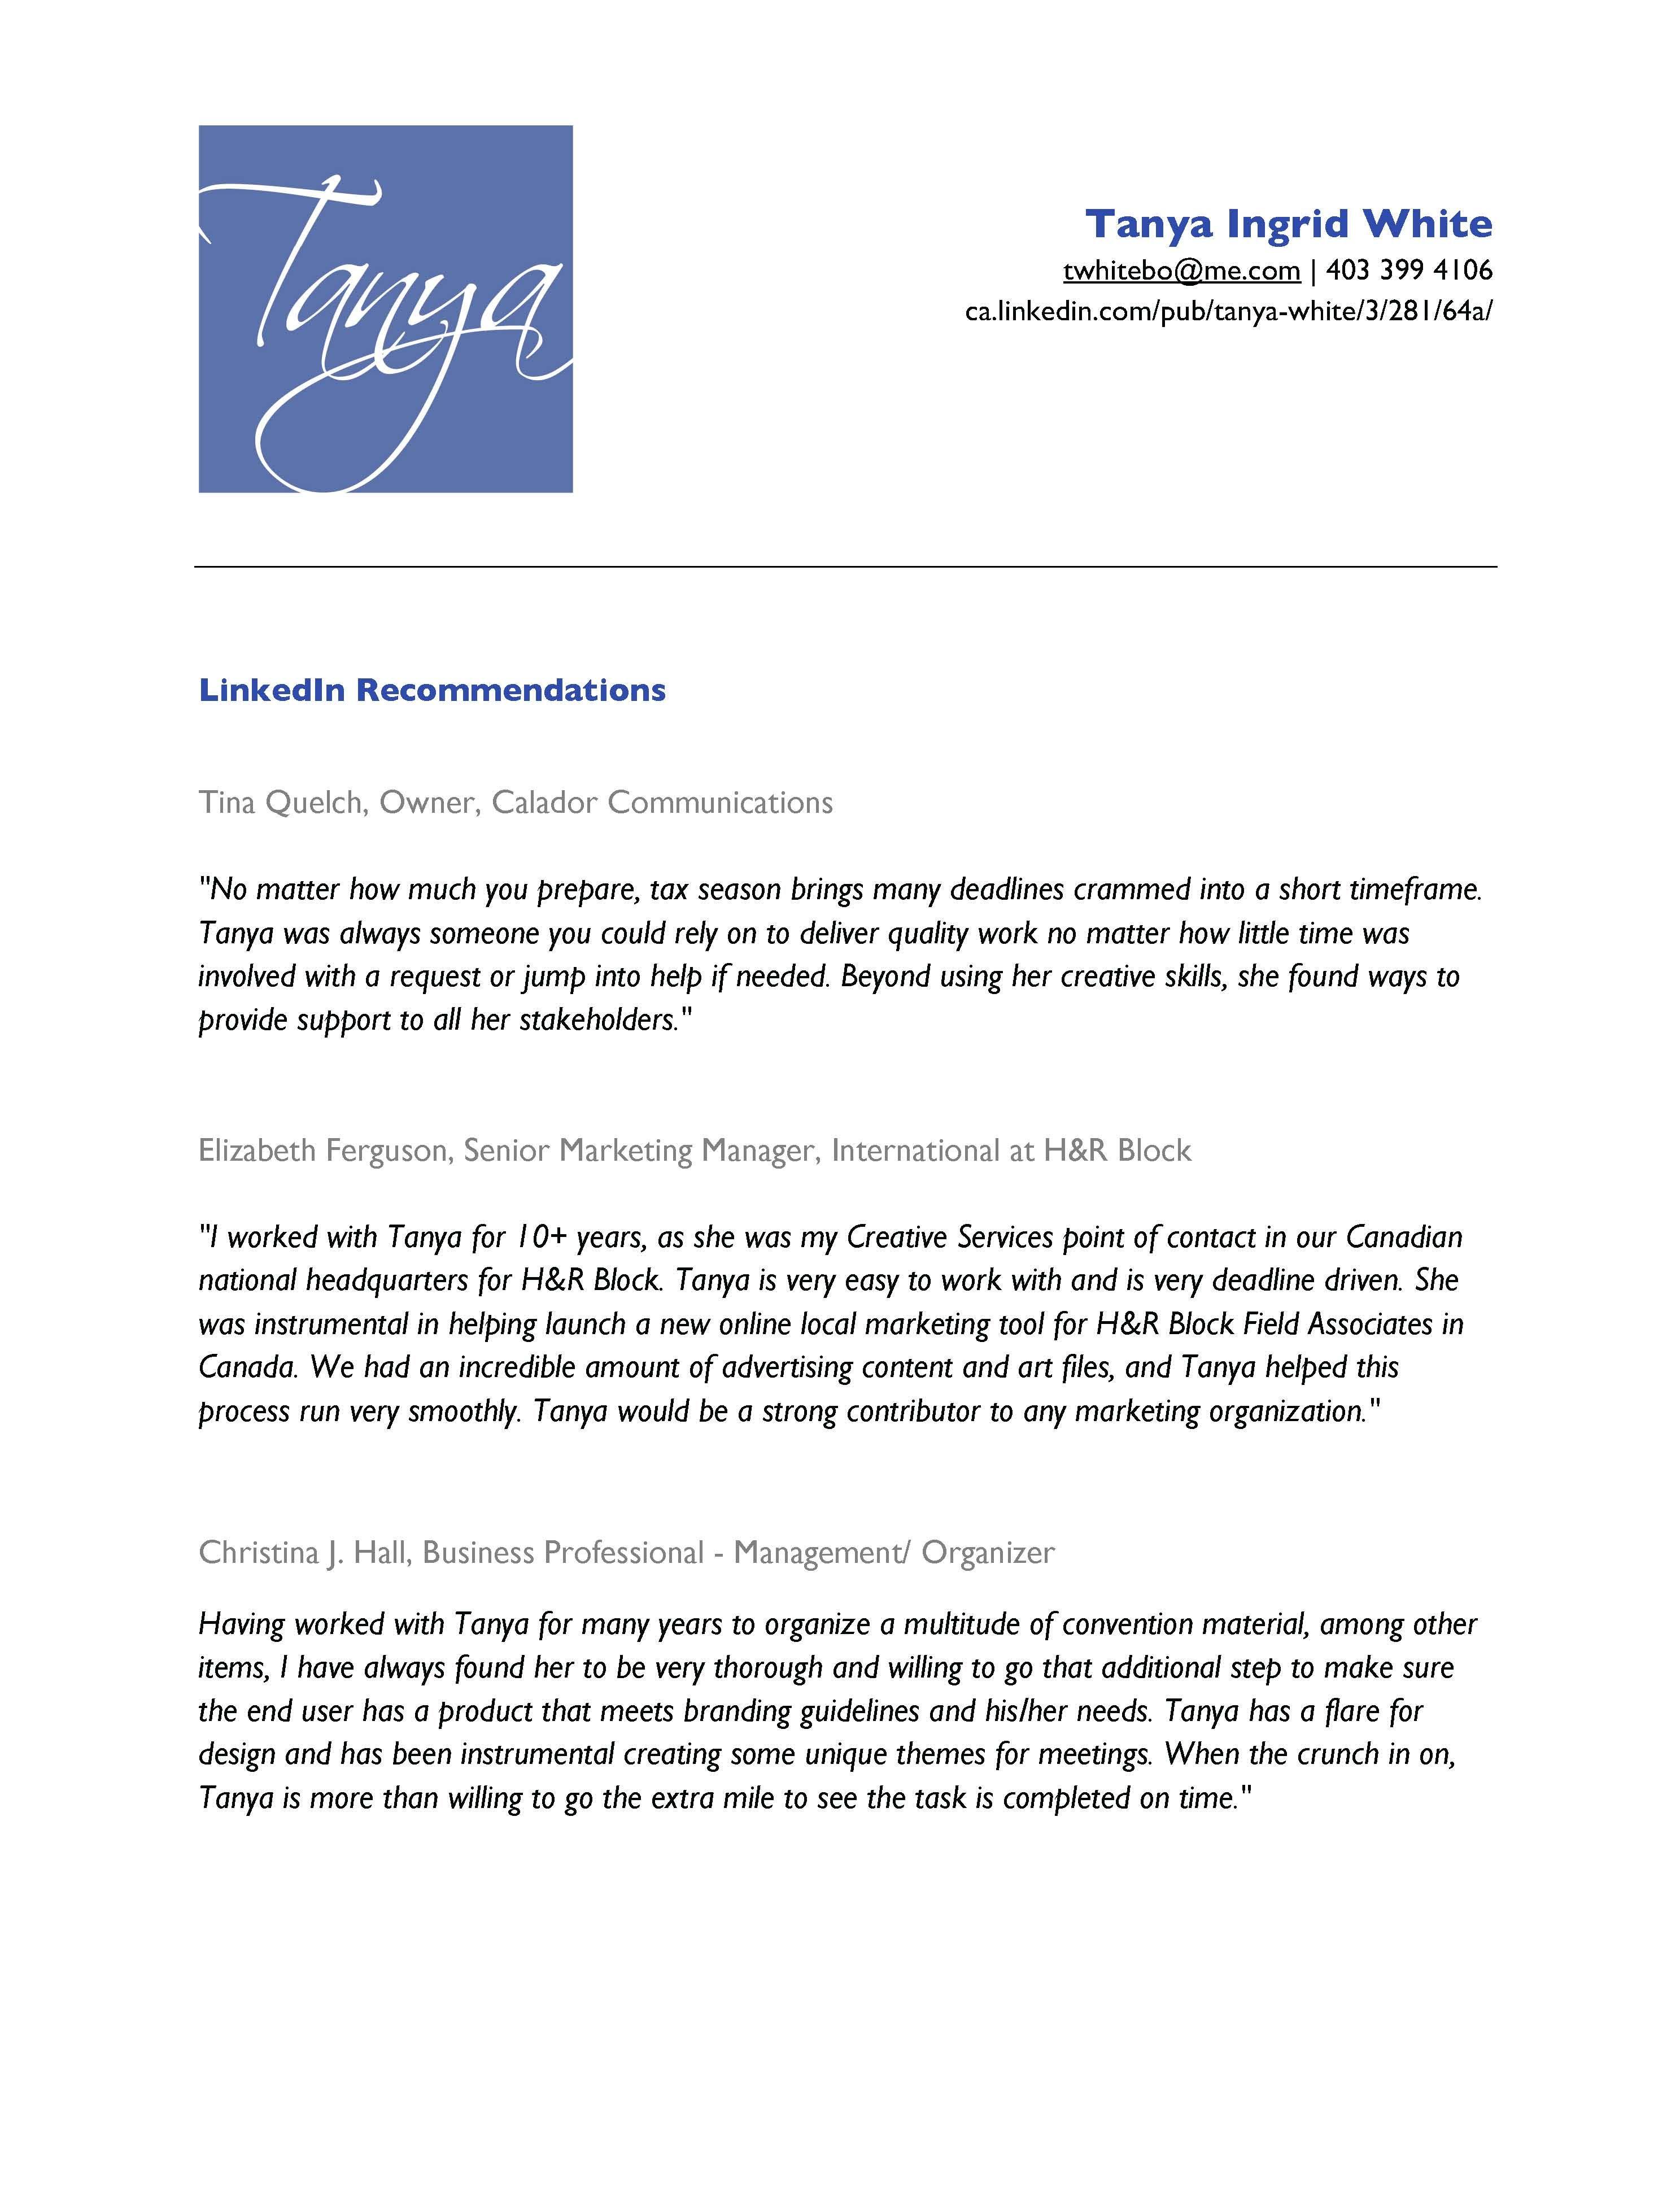 Recommended Resume Font Linkedin Recommendations  Linkedin  Pinterest